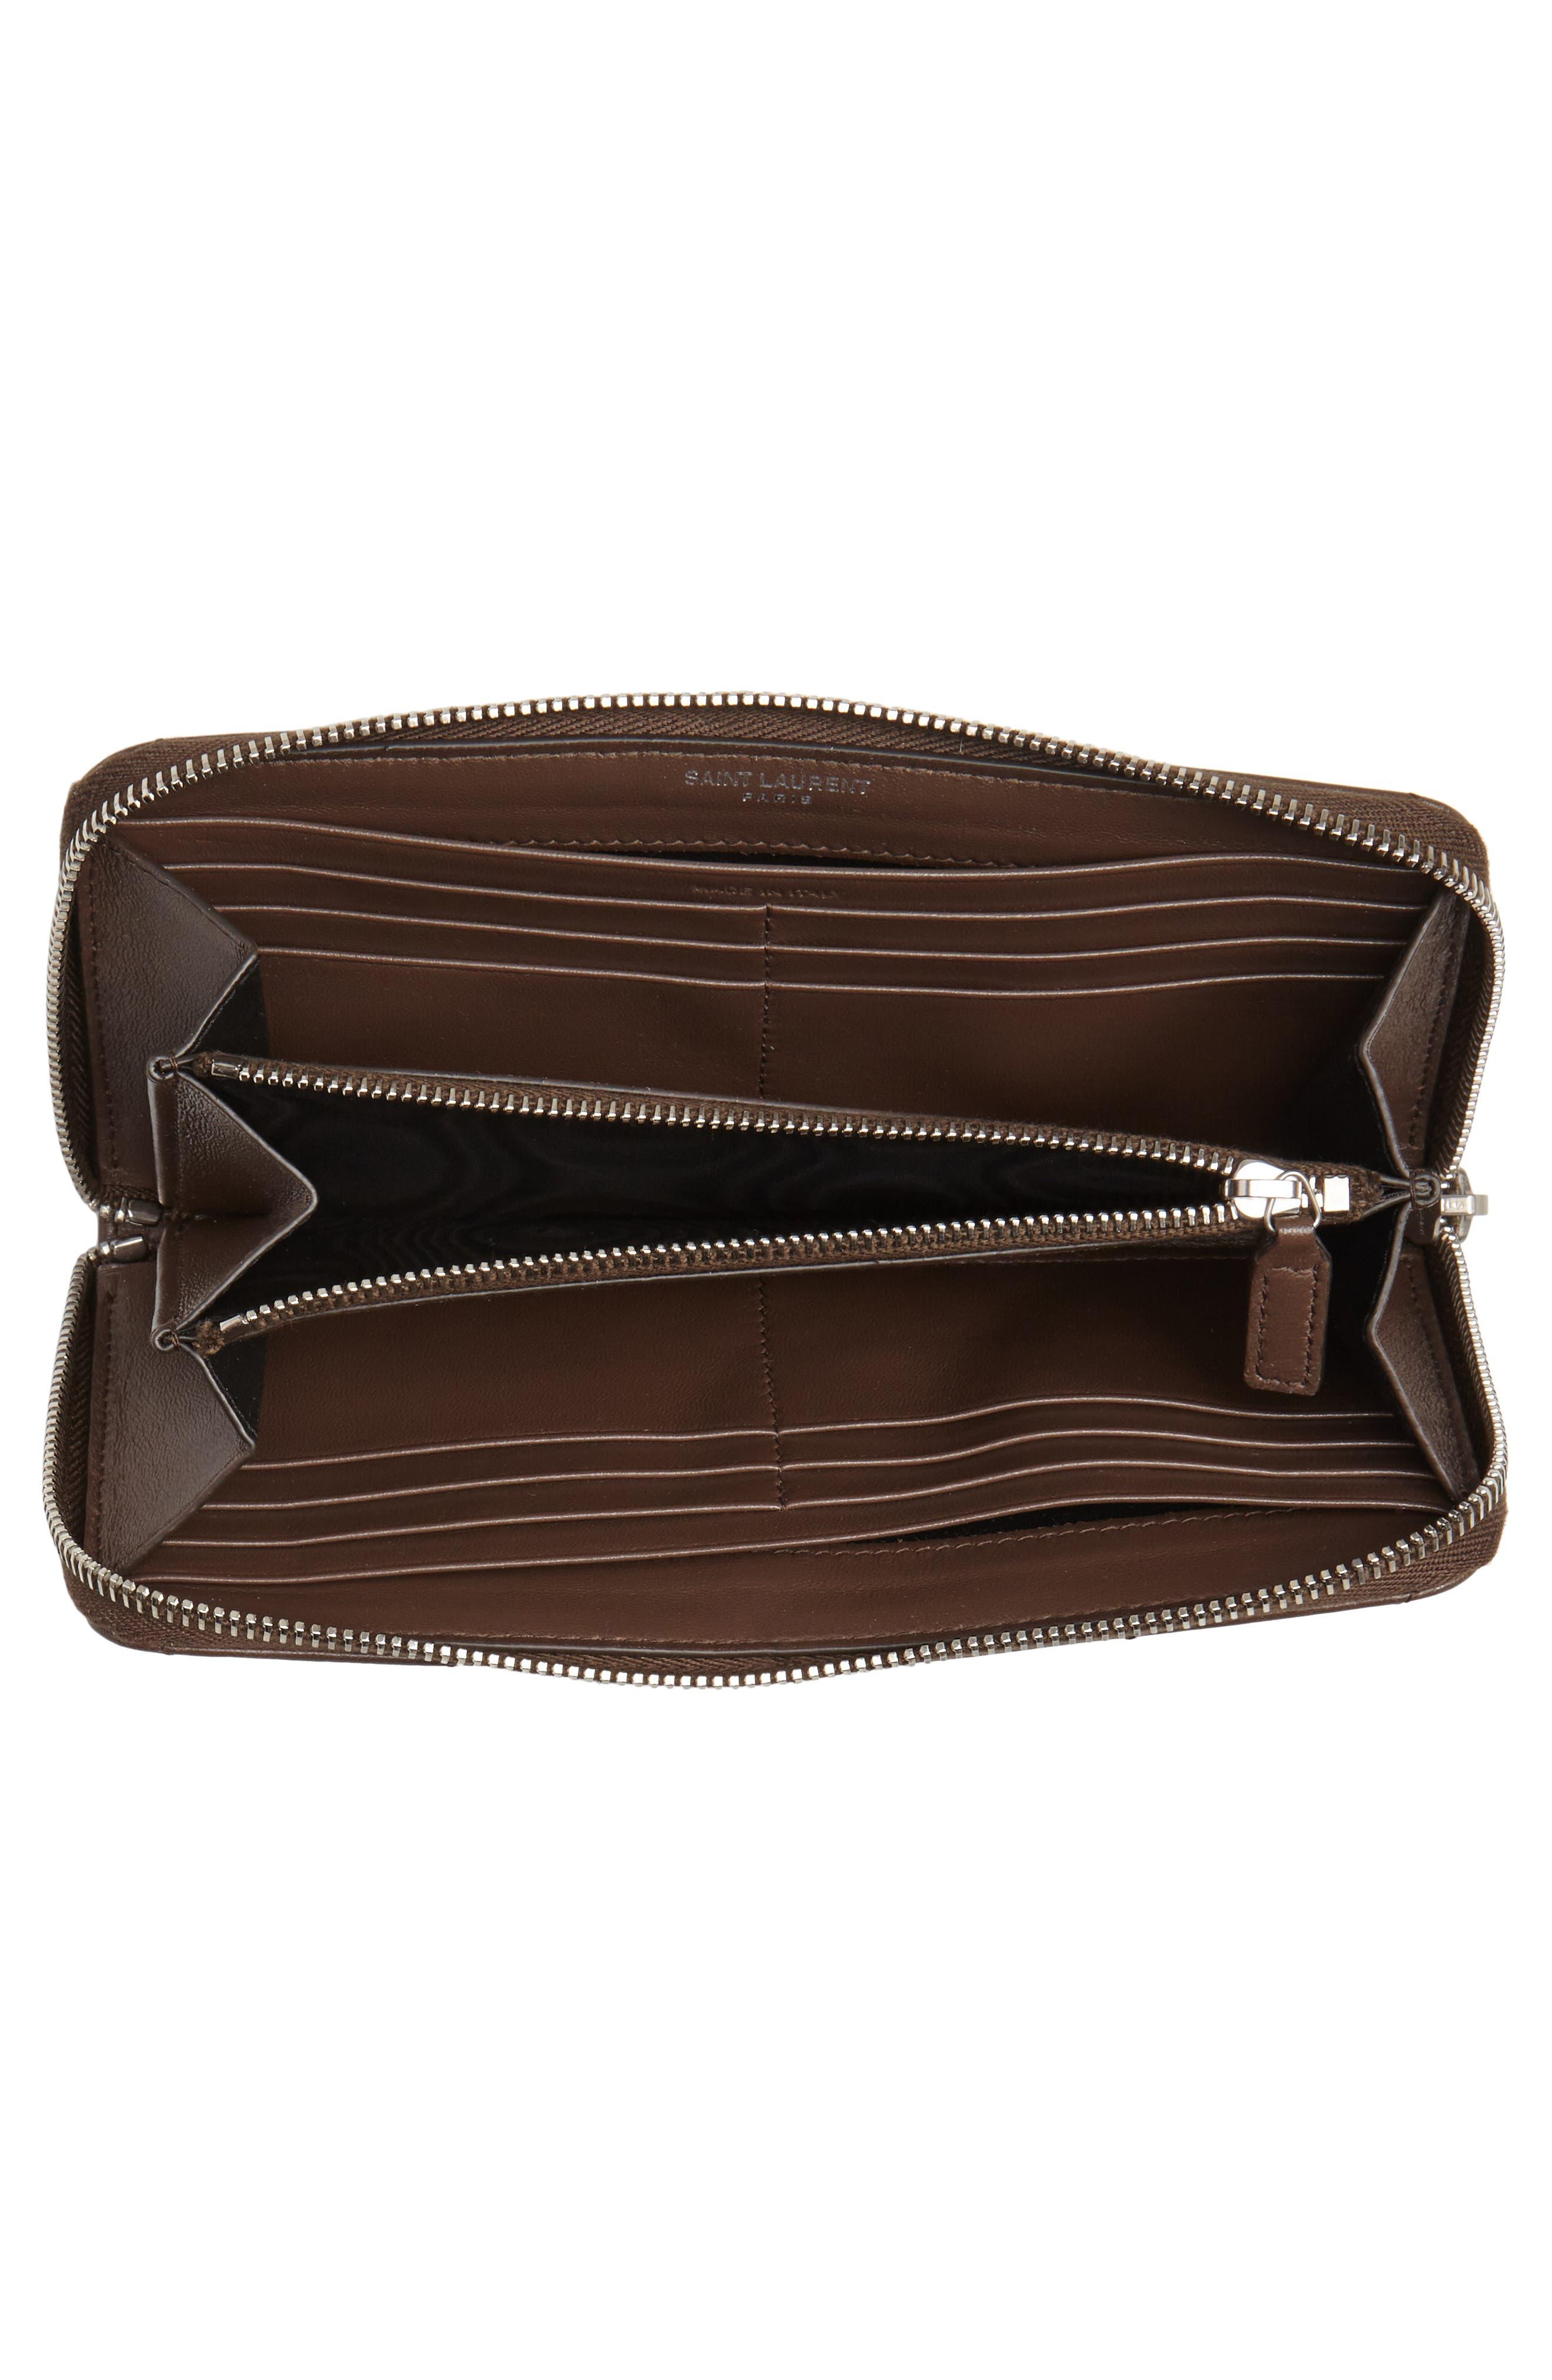 Loulou Matelassé Leather Zip-Around Wallet,                             Alternate thumbnail 4, color,                             FAGGIO